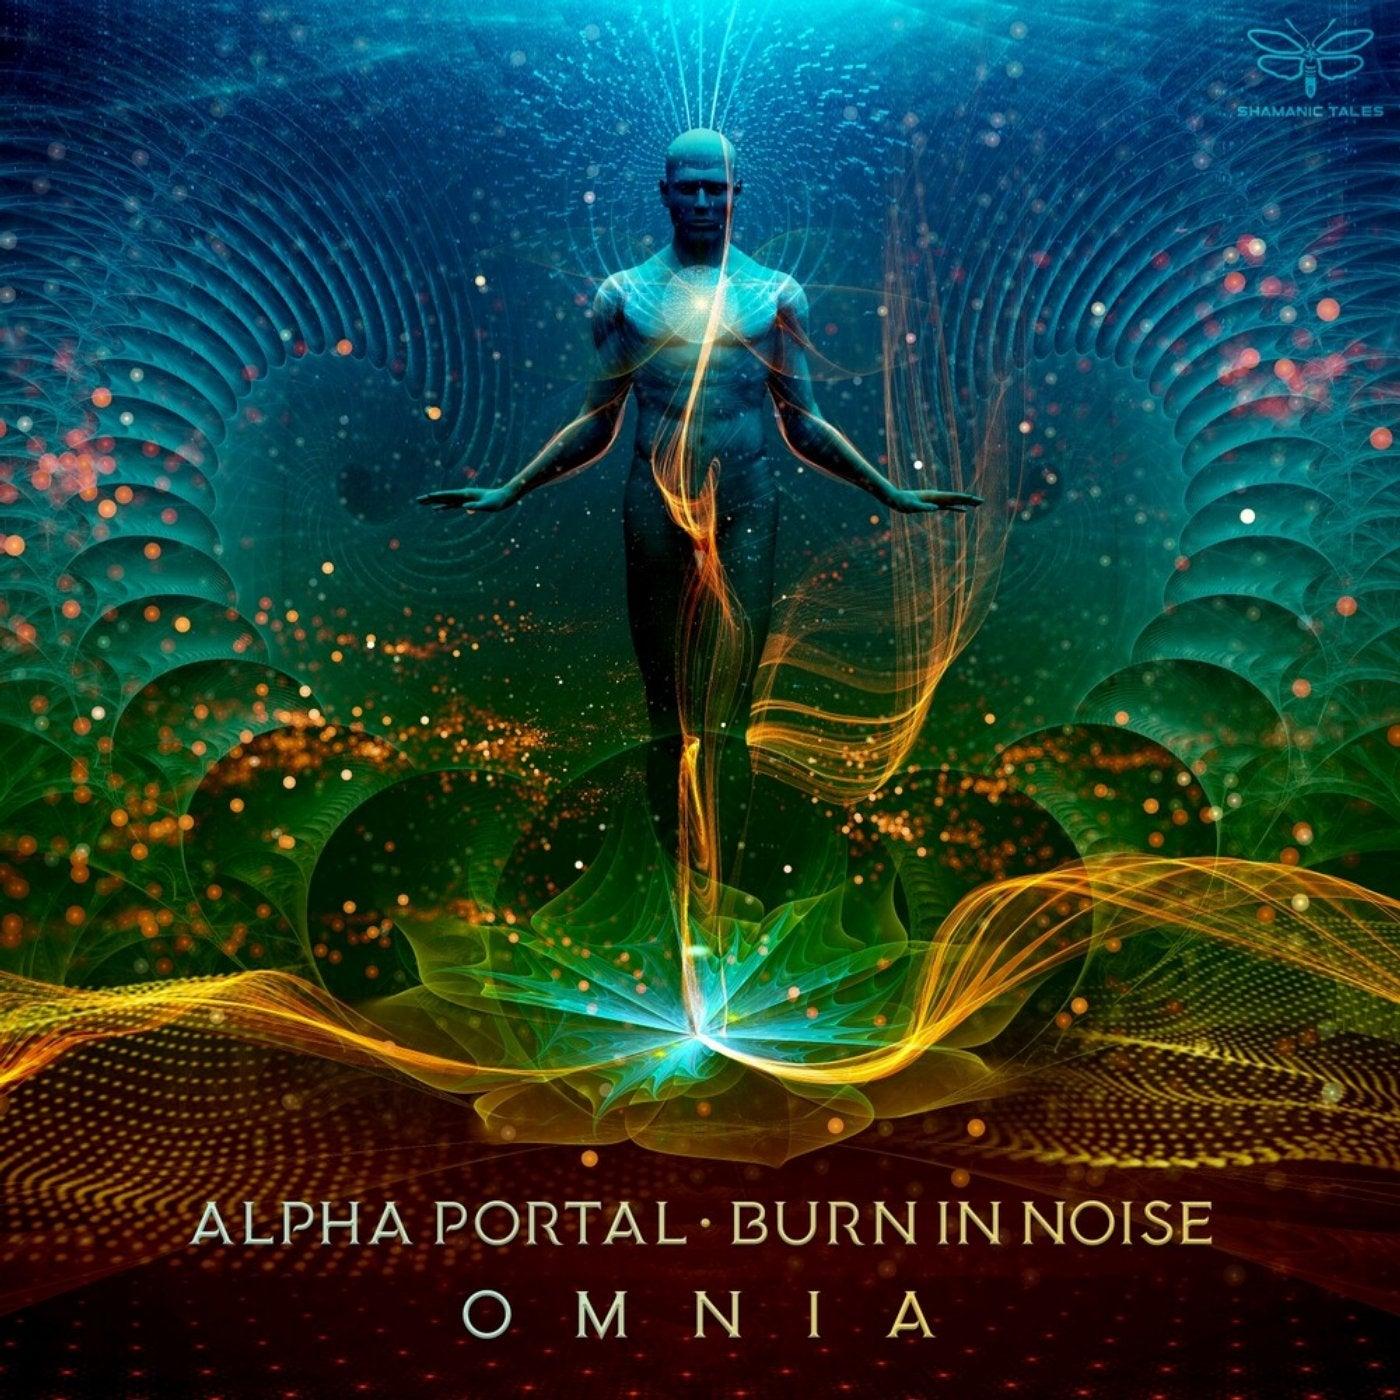 Omnia (Original Mix)